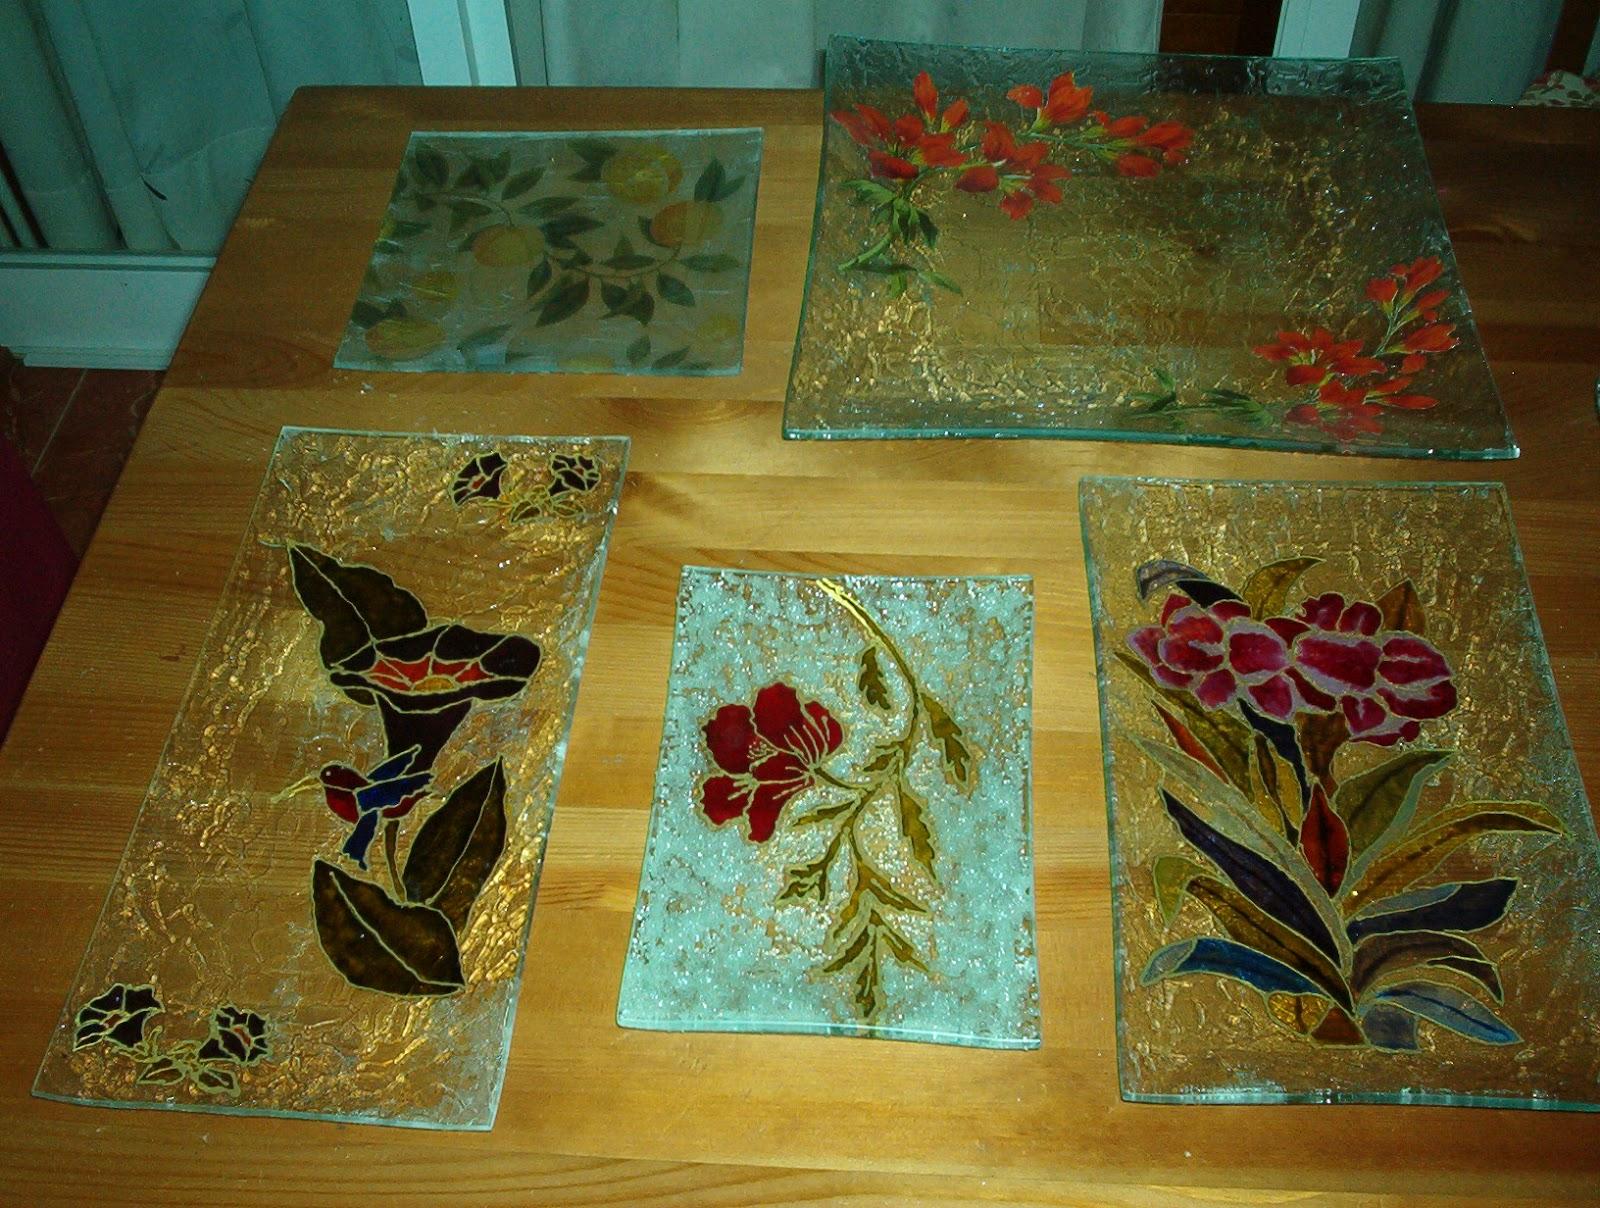 El divan del arte pintura sobre cristal for Cuadros de metacrilato